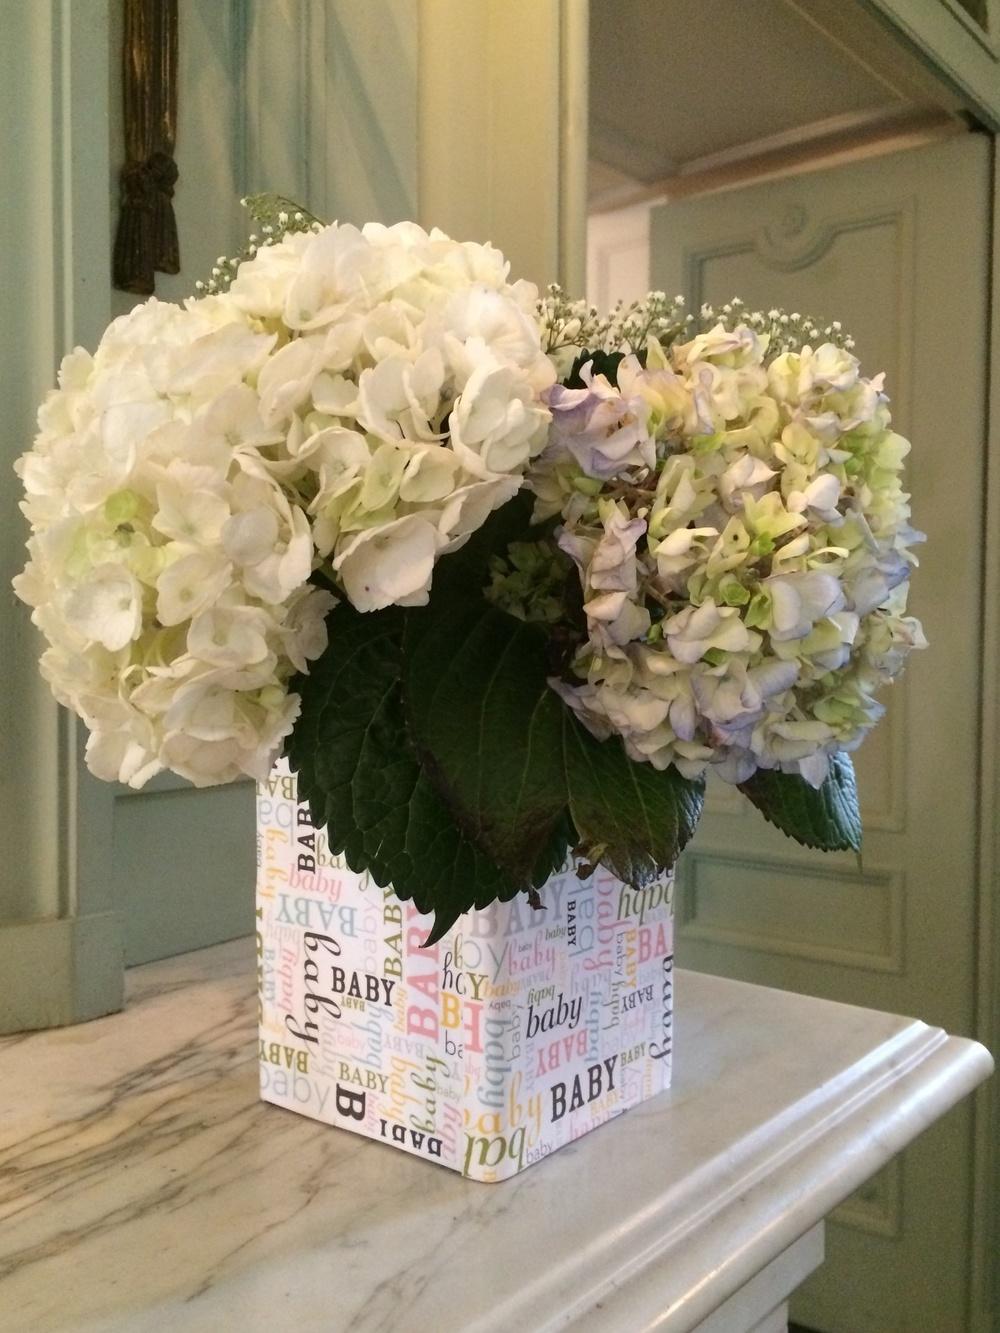 Melissa's Favorite Flowers